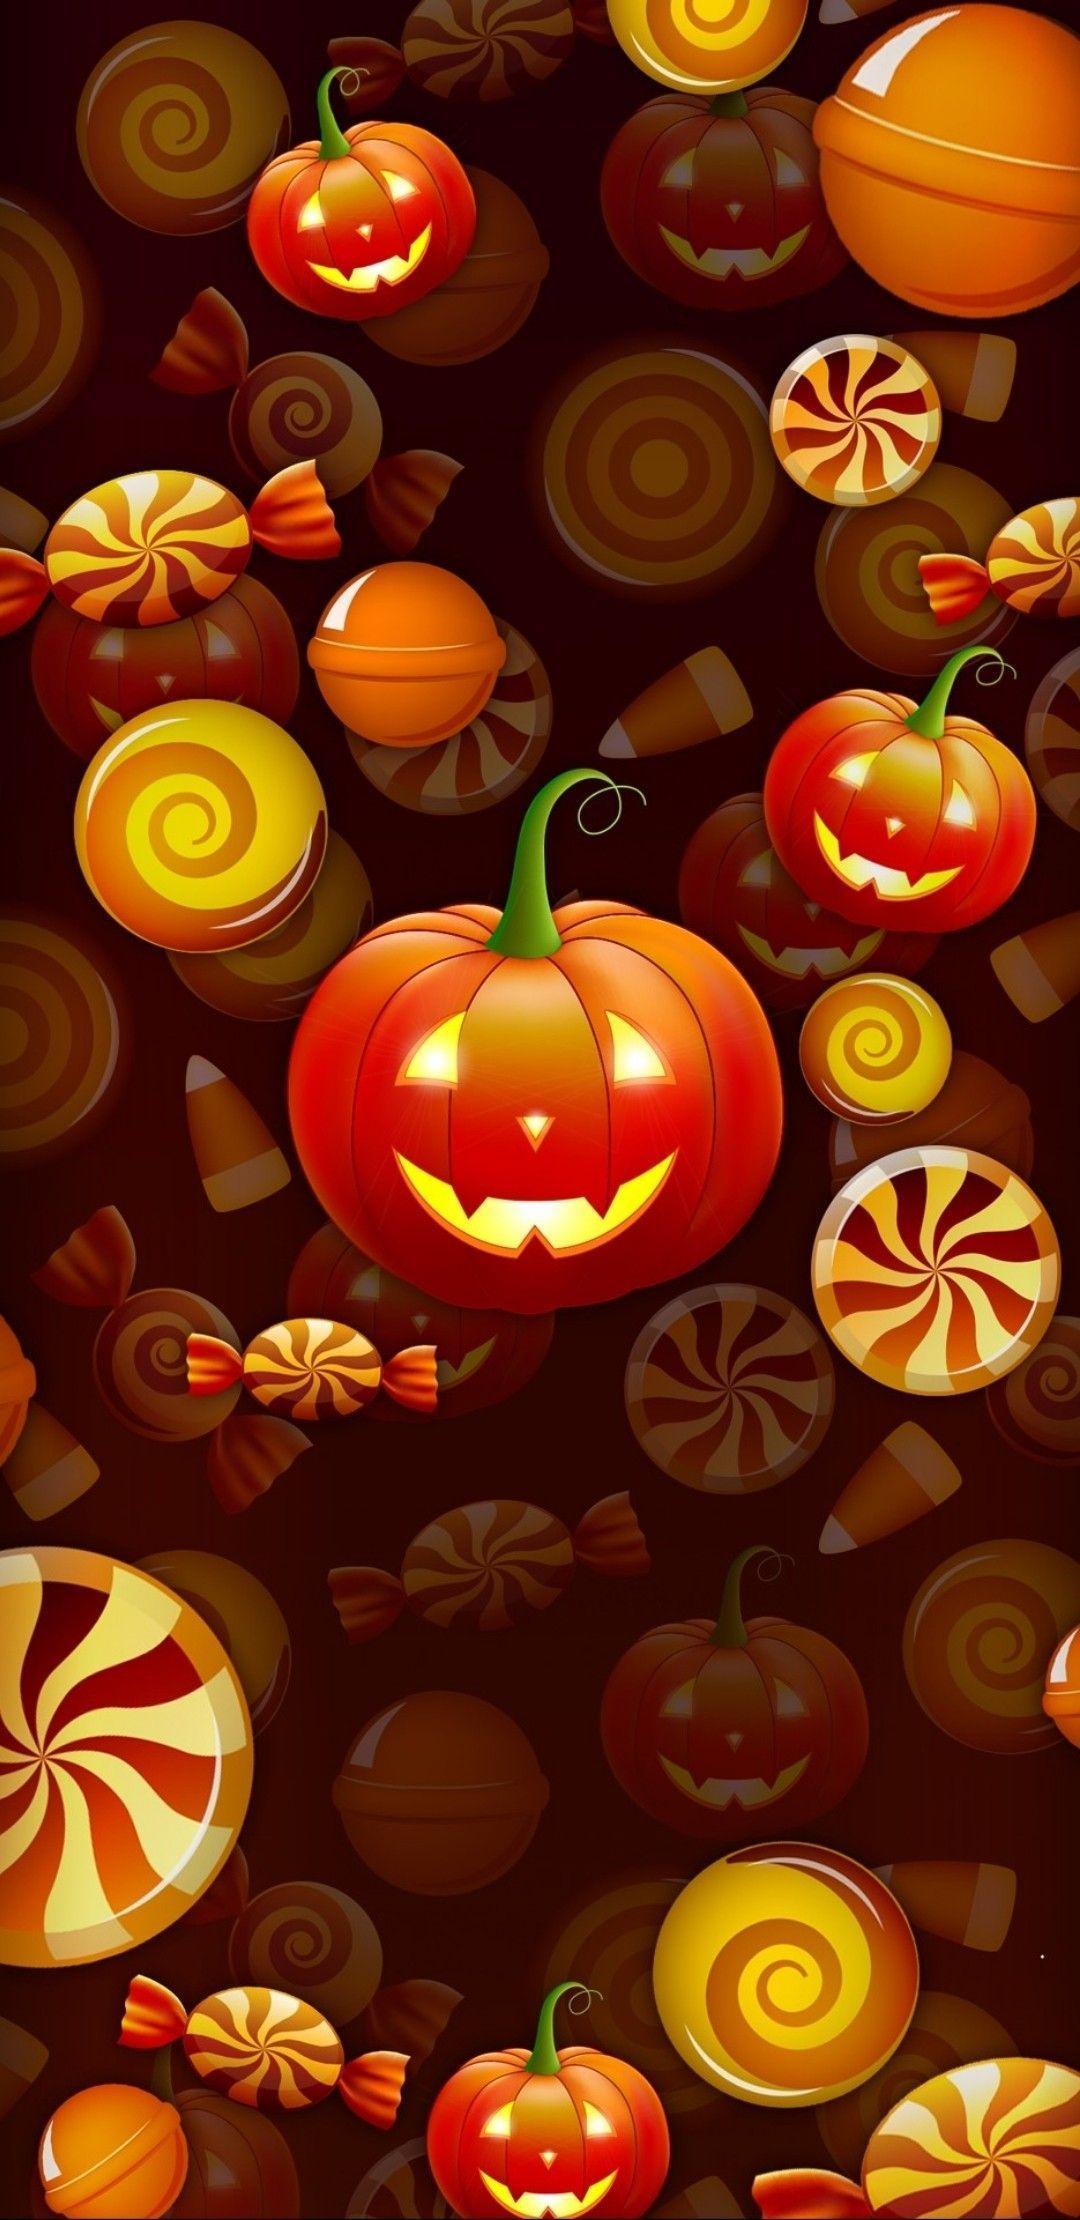 Fall Halloween Iphone Wallpapers Top Free Fall Halloween Iphone